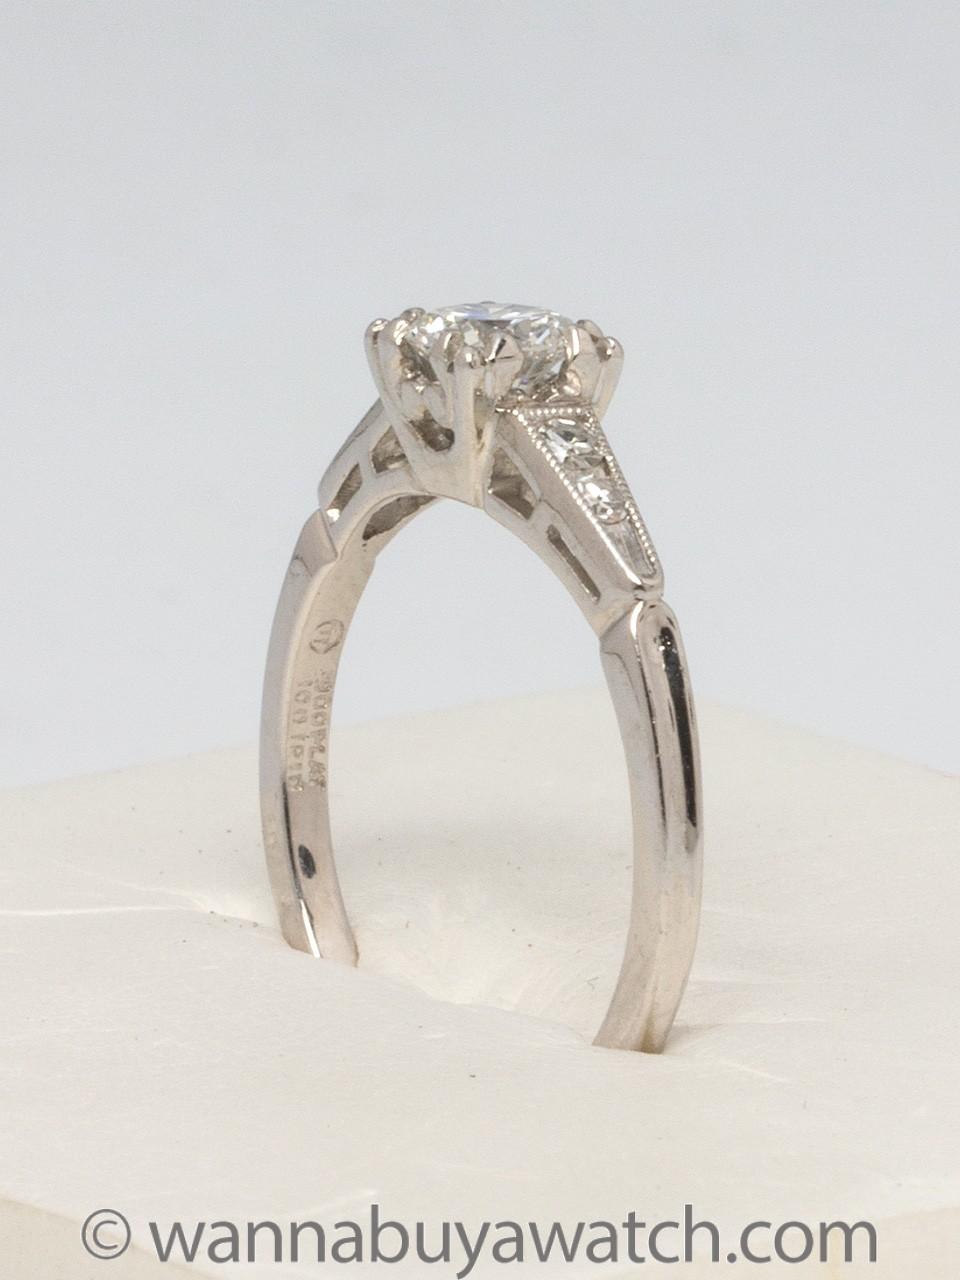 Vintage Platinum Diamond Engagement Ring 0.50ct Transitional Cut G-VS1 circa 1950s